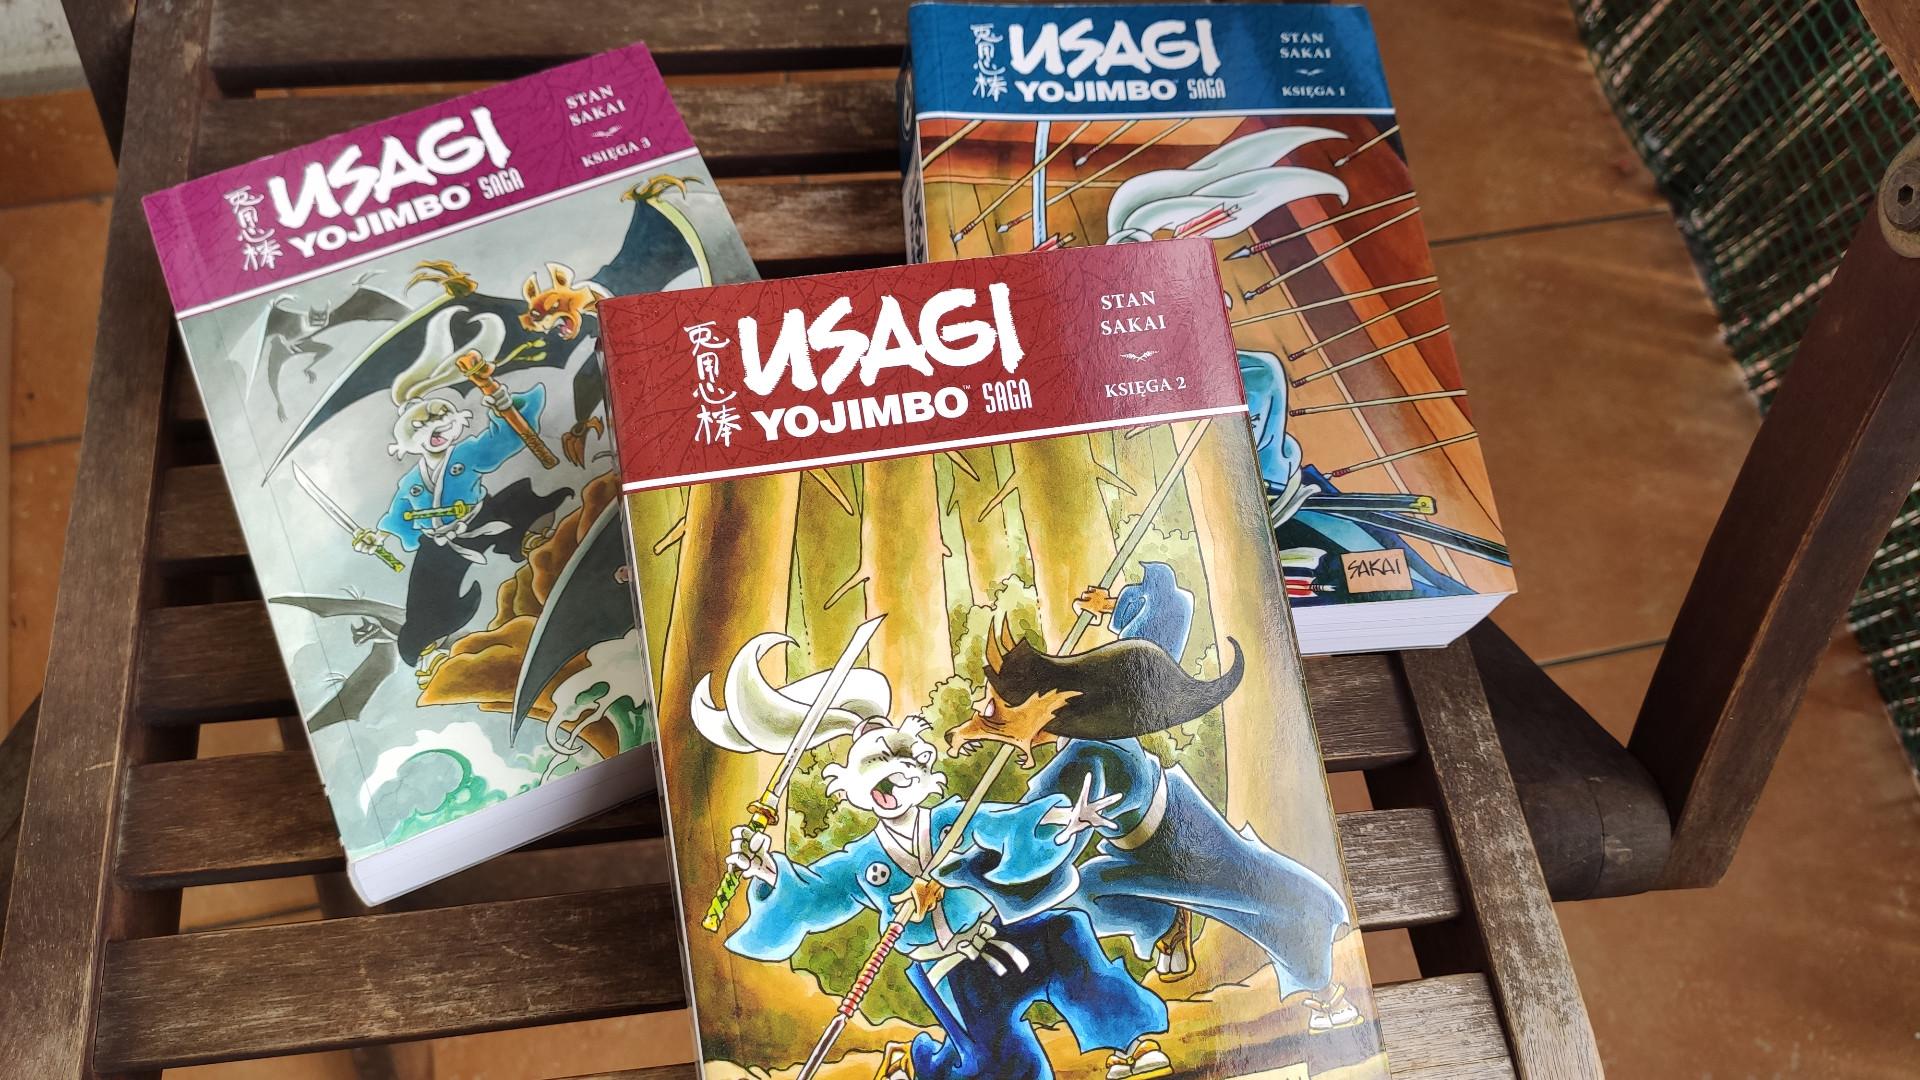 Usagi saga